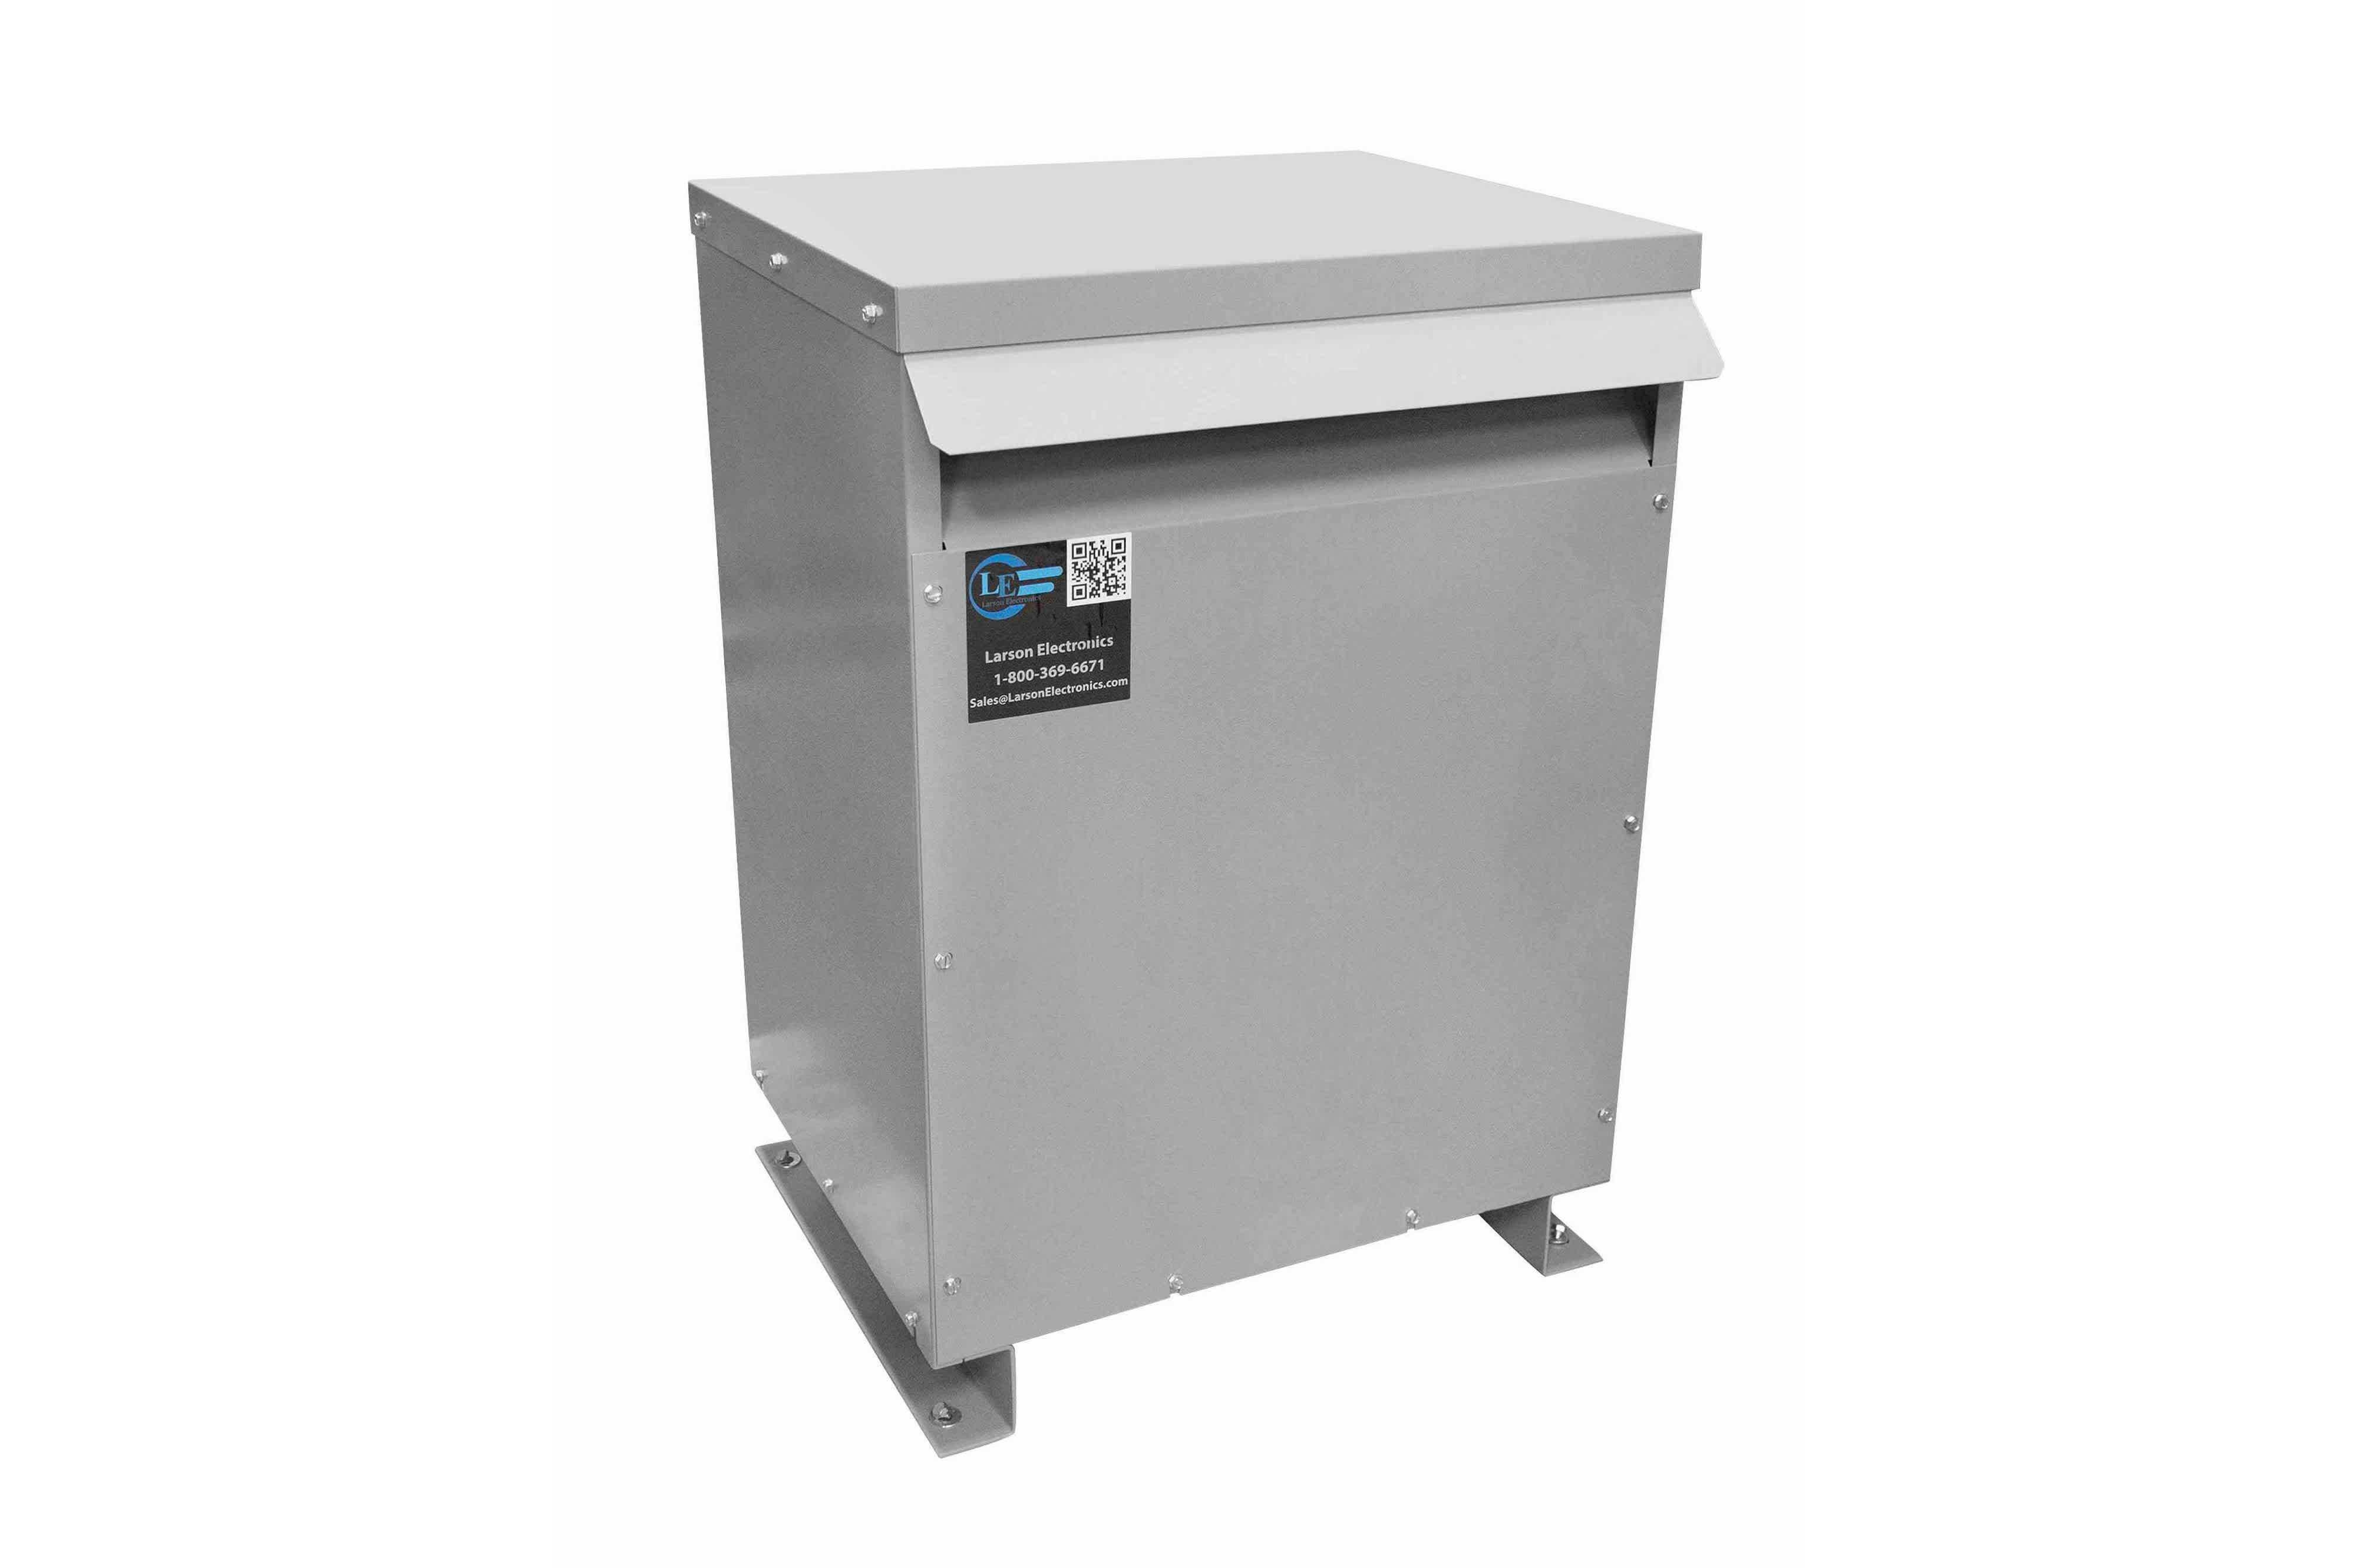 175 kVA 3PH Isolation Transformer, 230V Wye Primary, 208V Delta Secondary, N3R, Ventilated, 60 Hz